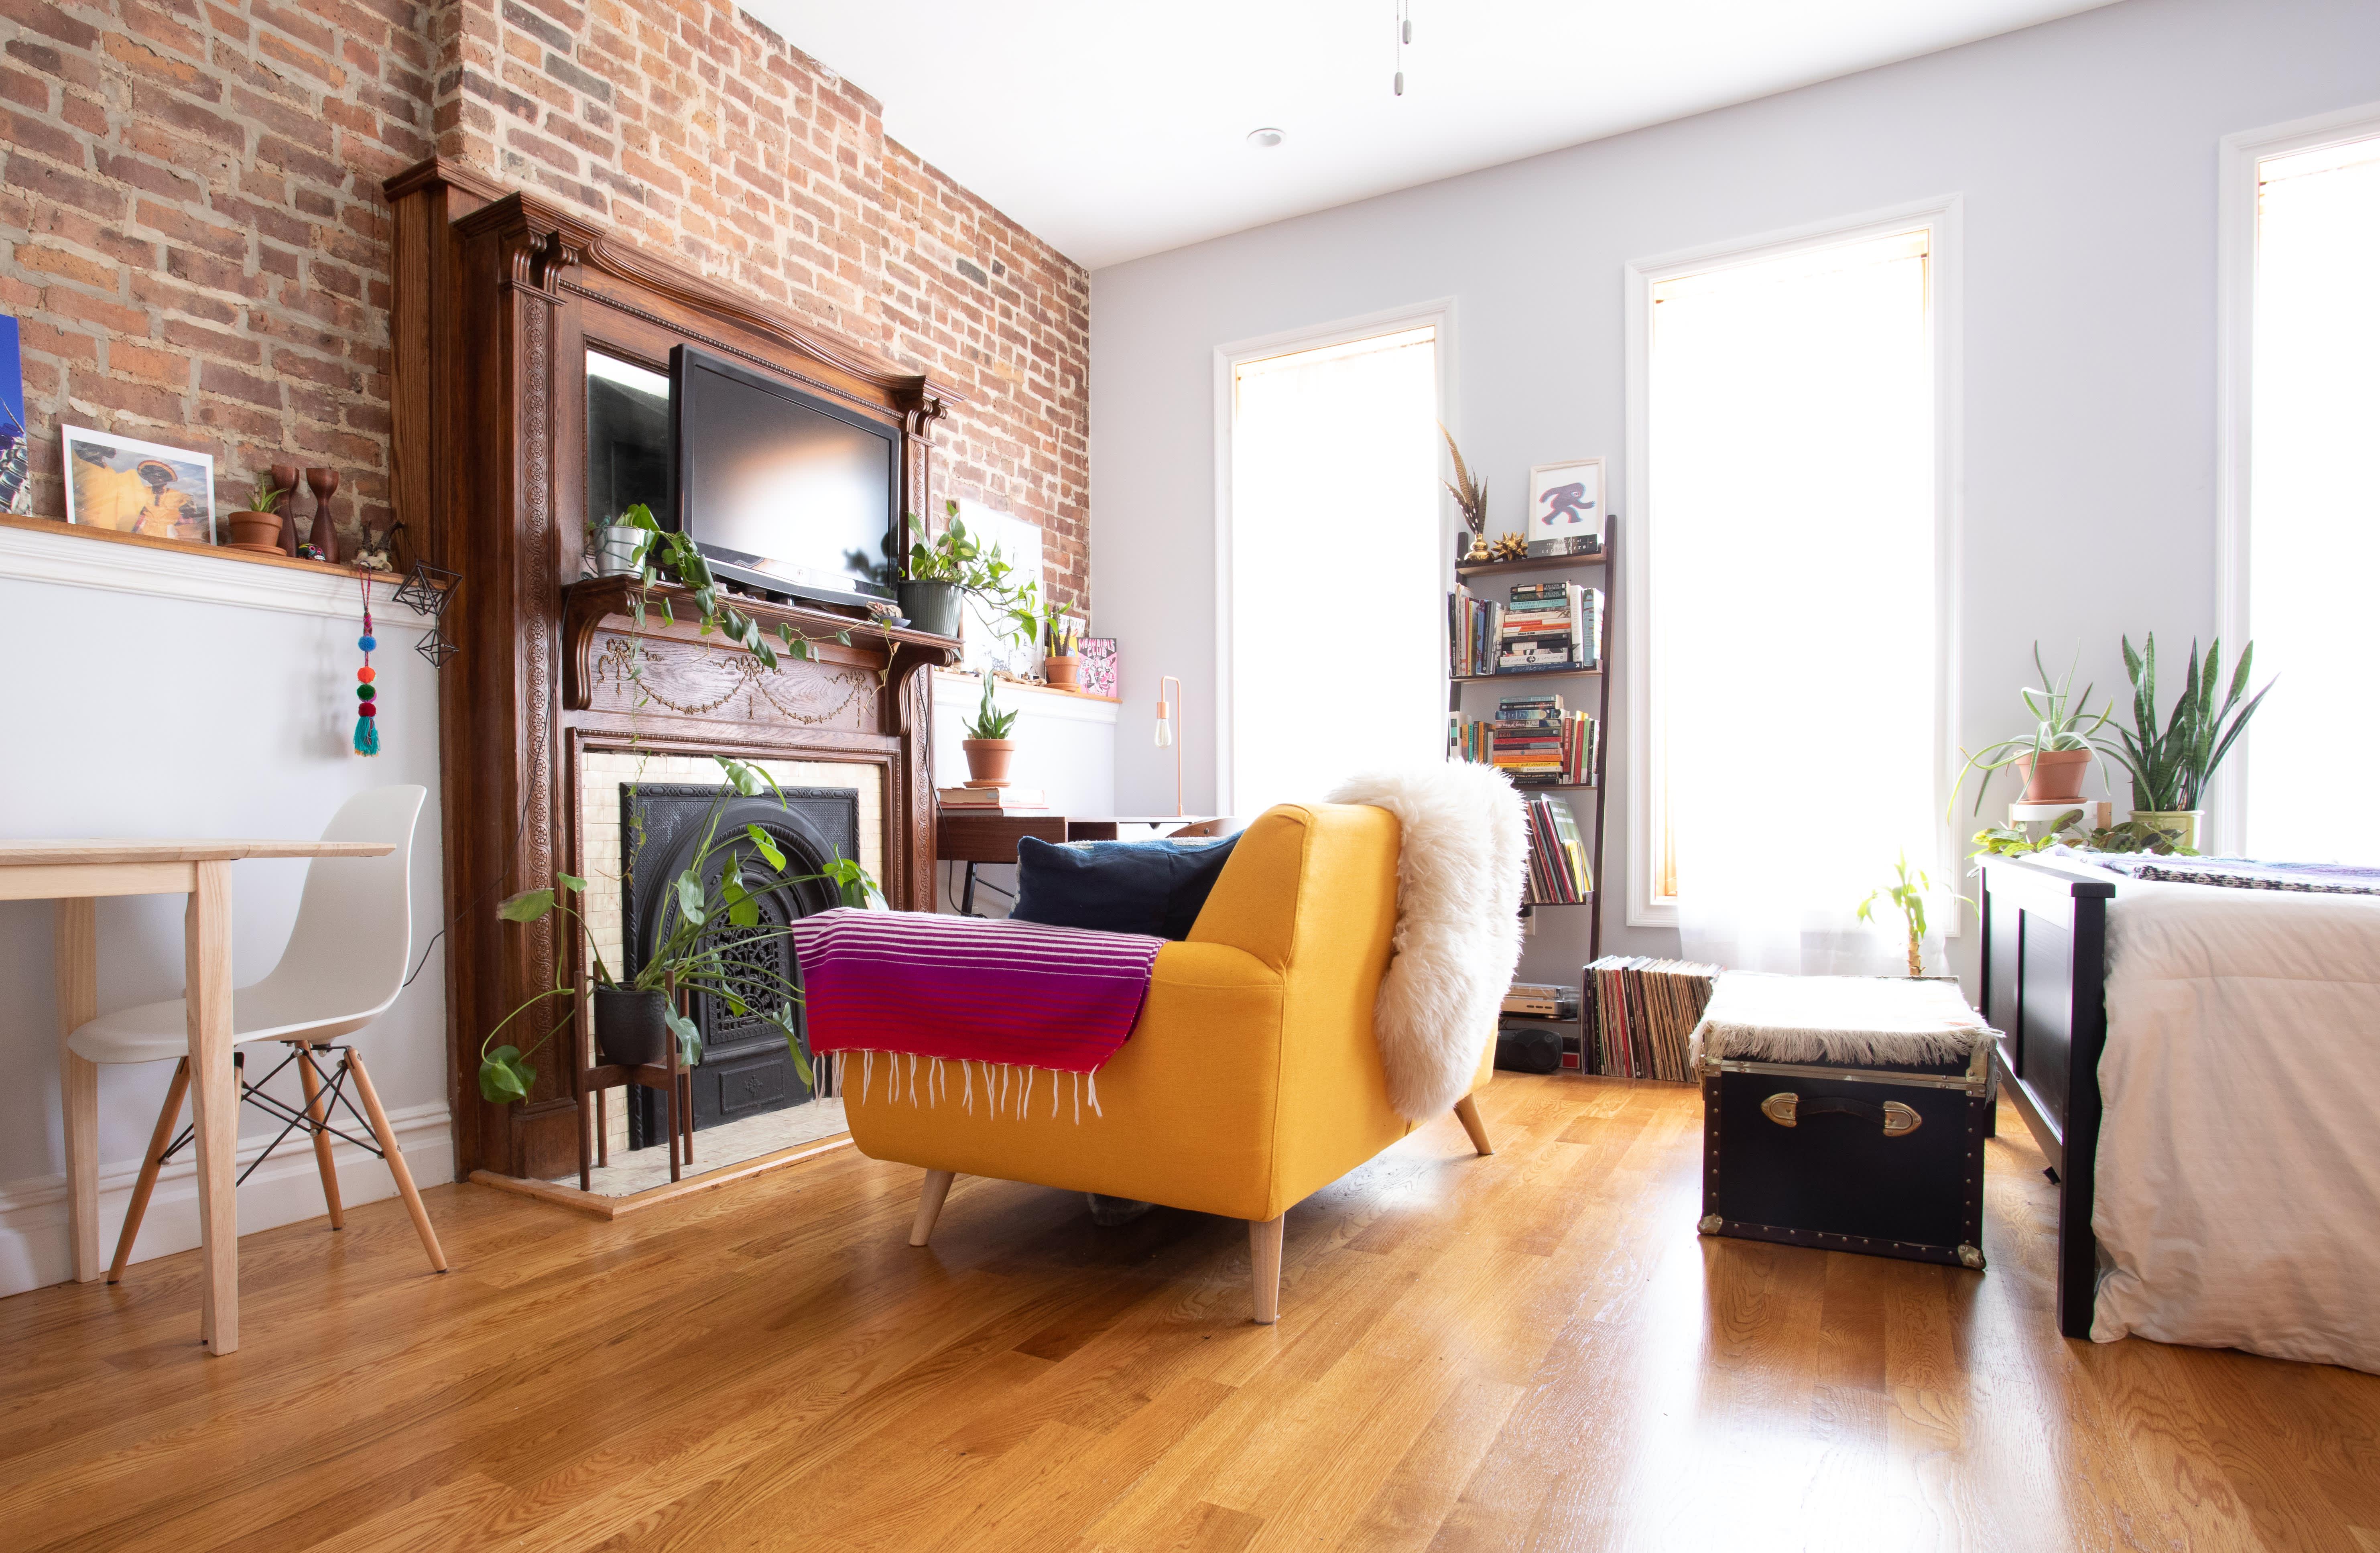 A 208-Square-Foot Brooklyn Studio Apartment Feels Much Bigger